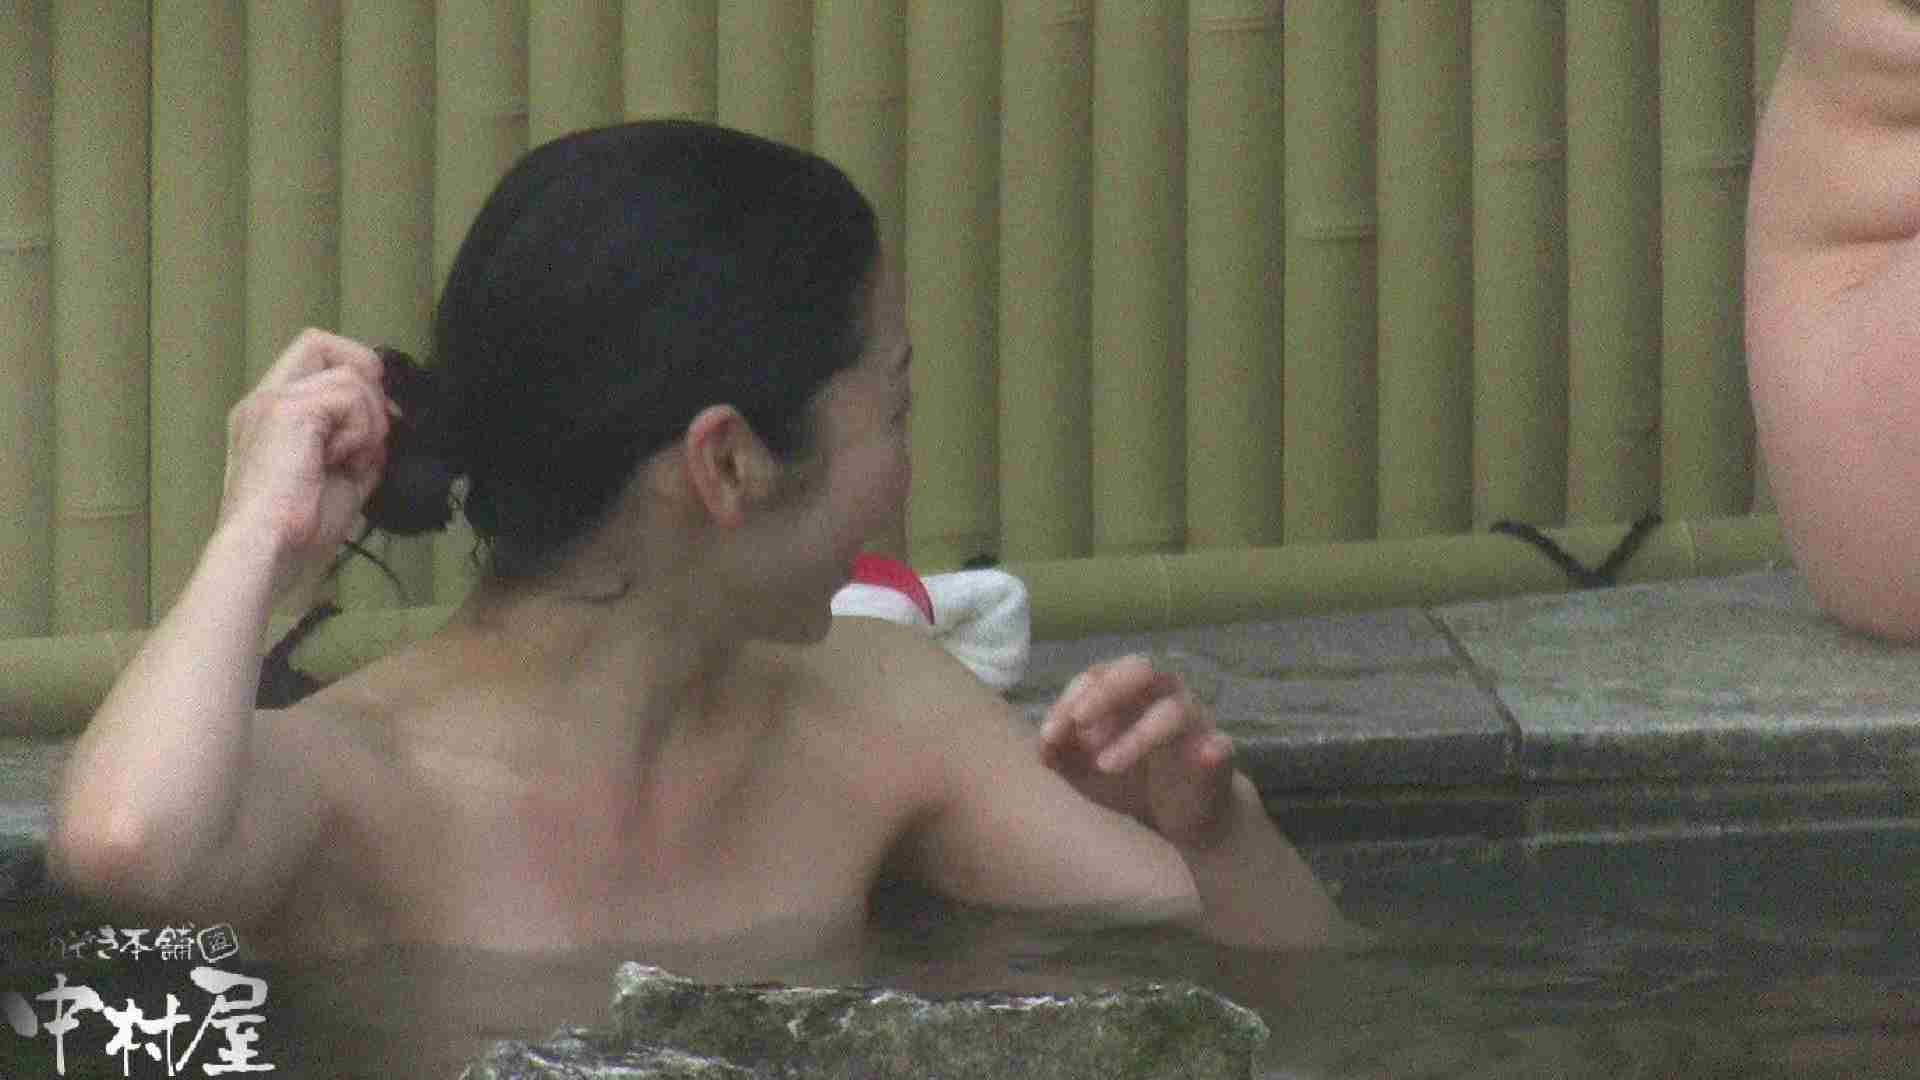 Aquaな露天風呂Vol.917 露天 セックス無修正動画無料 102画像 59